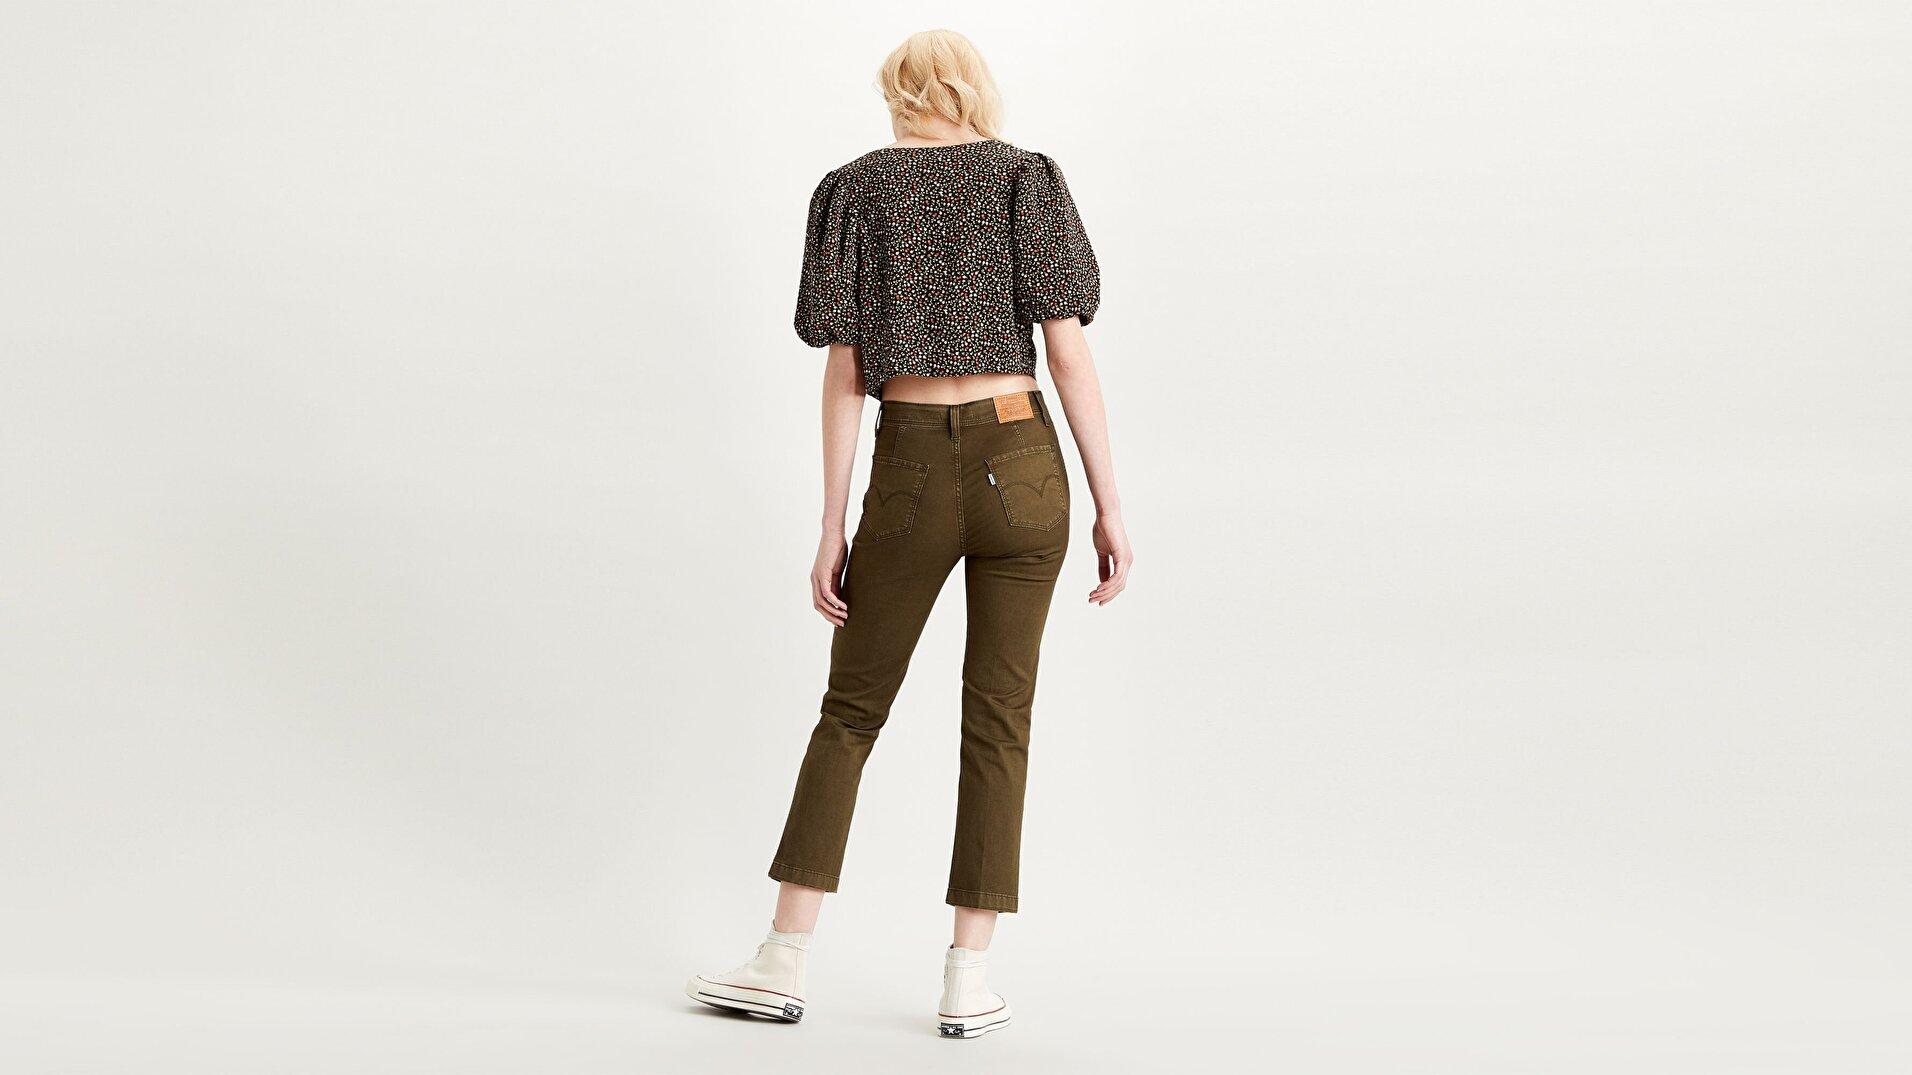 724 Yüksek Bel Düz Kesim Cropped Kadın Jean Pantolon-Soft Canvas  Night Od